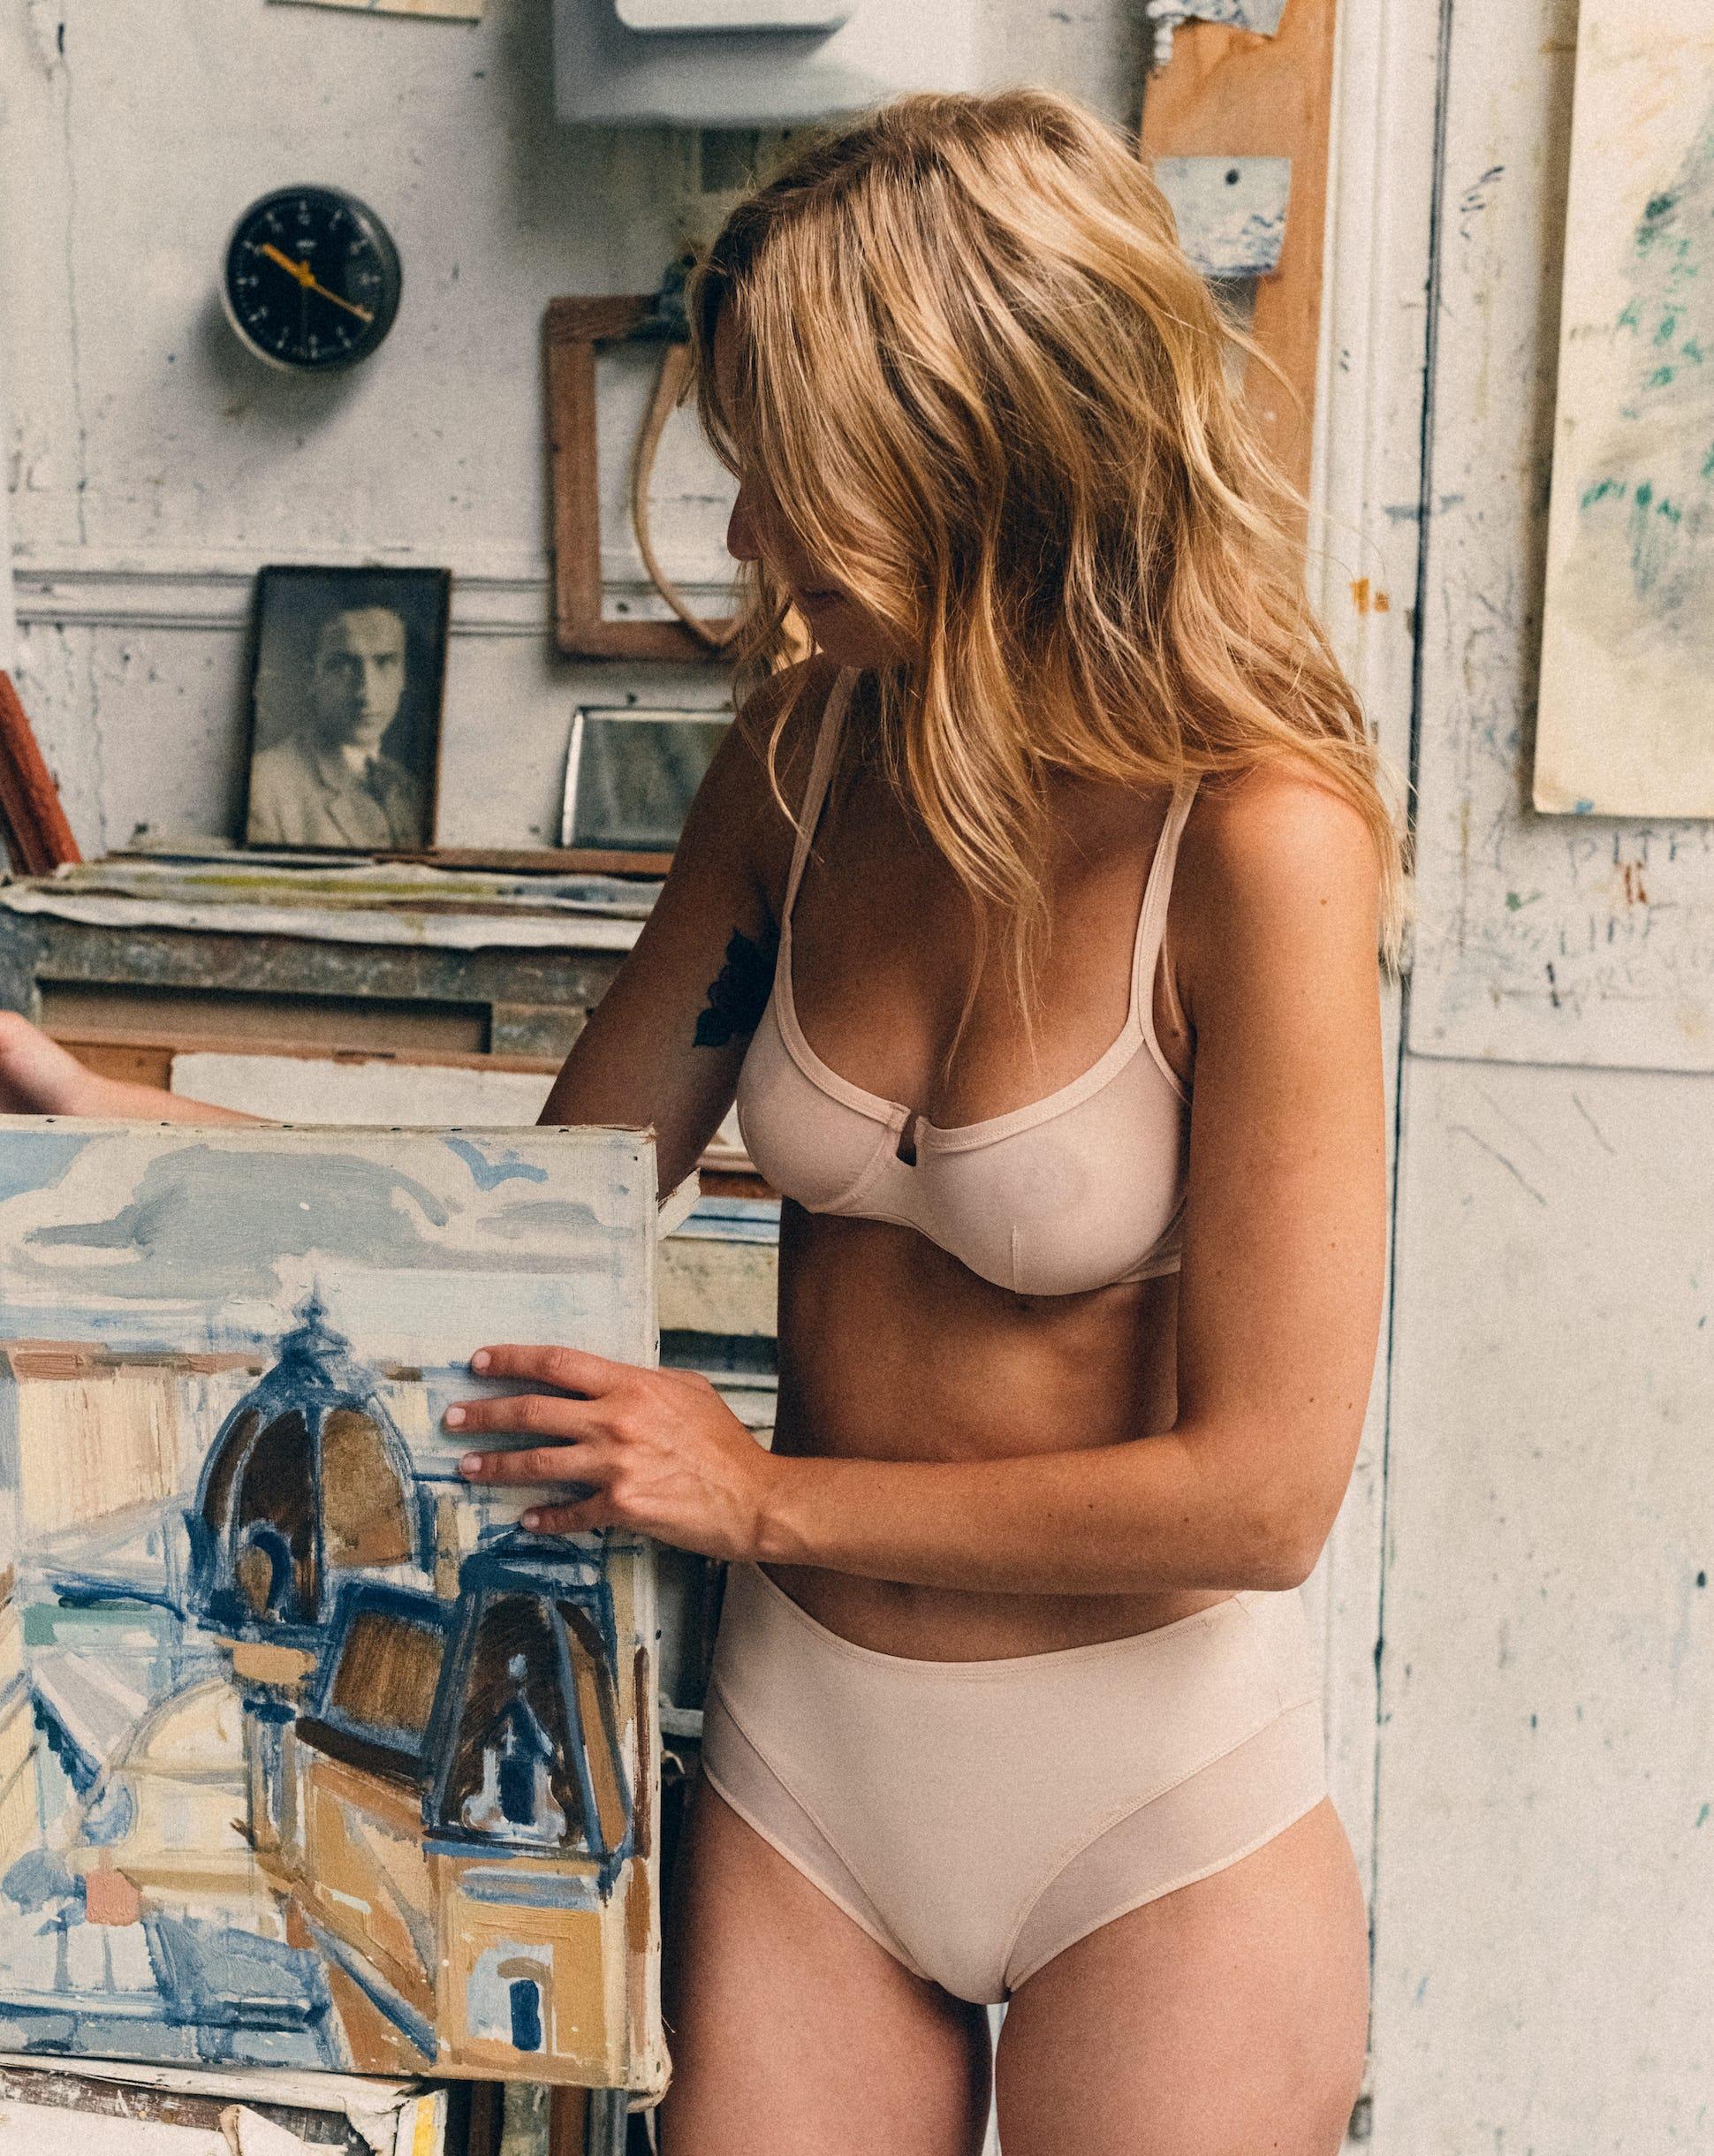 Corbeille histoire de femmes nude